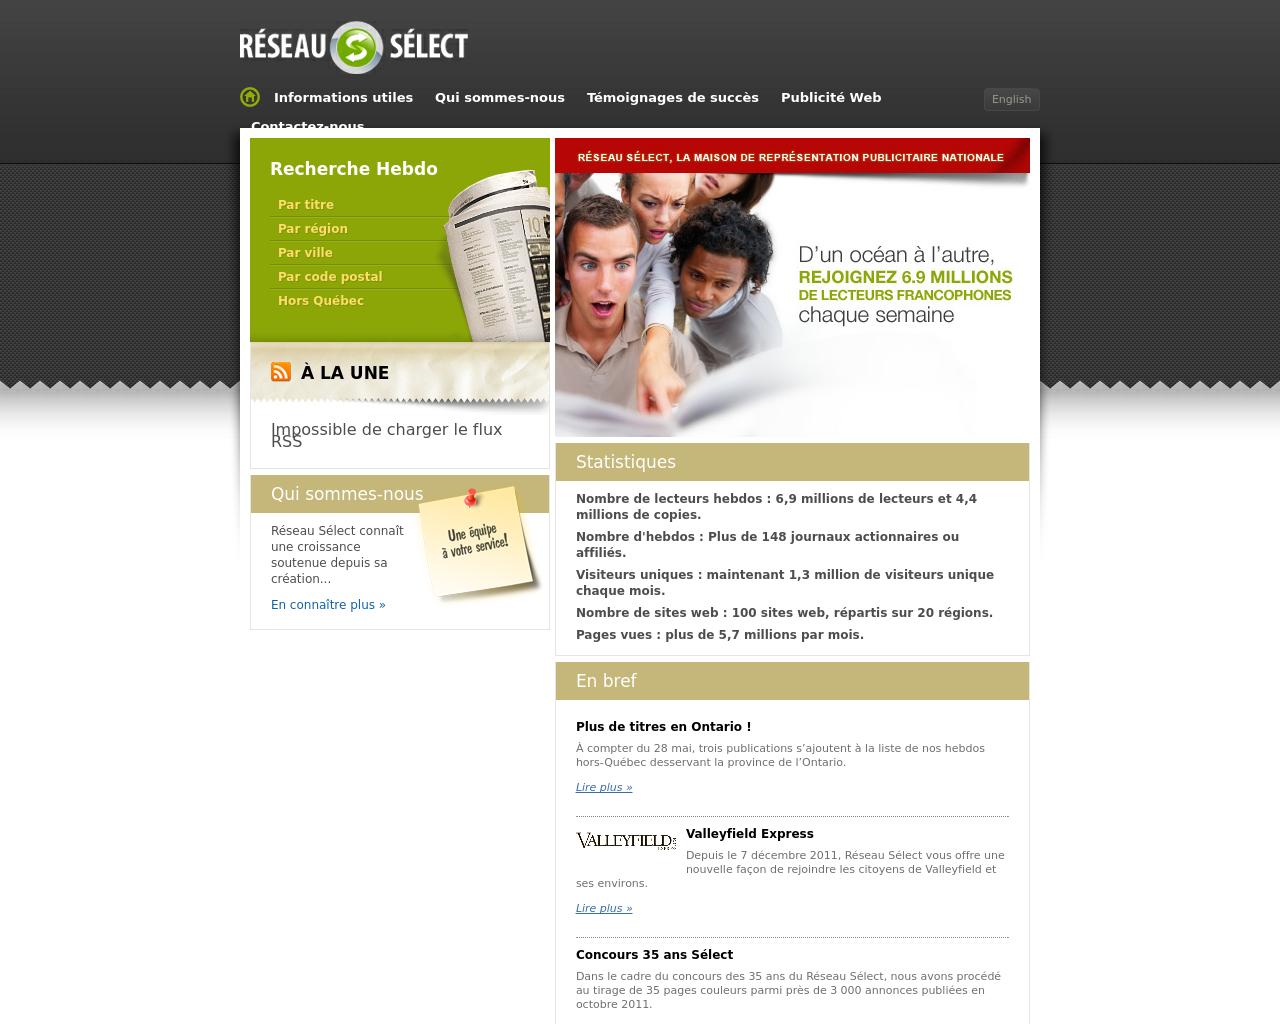 Reseau-Select-Advertising-Reviews-Pricing